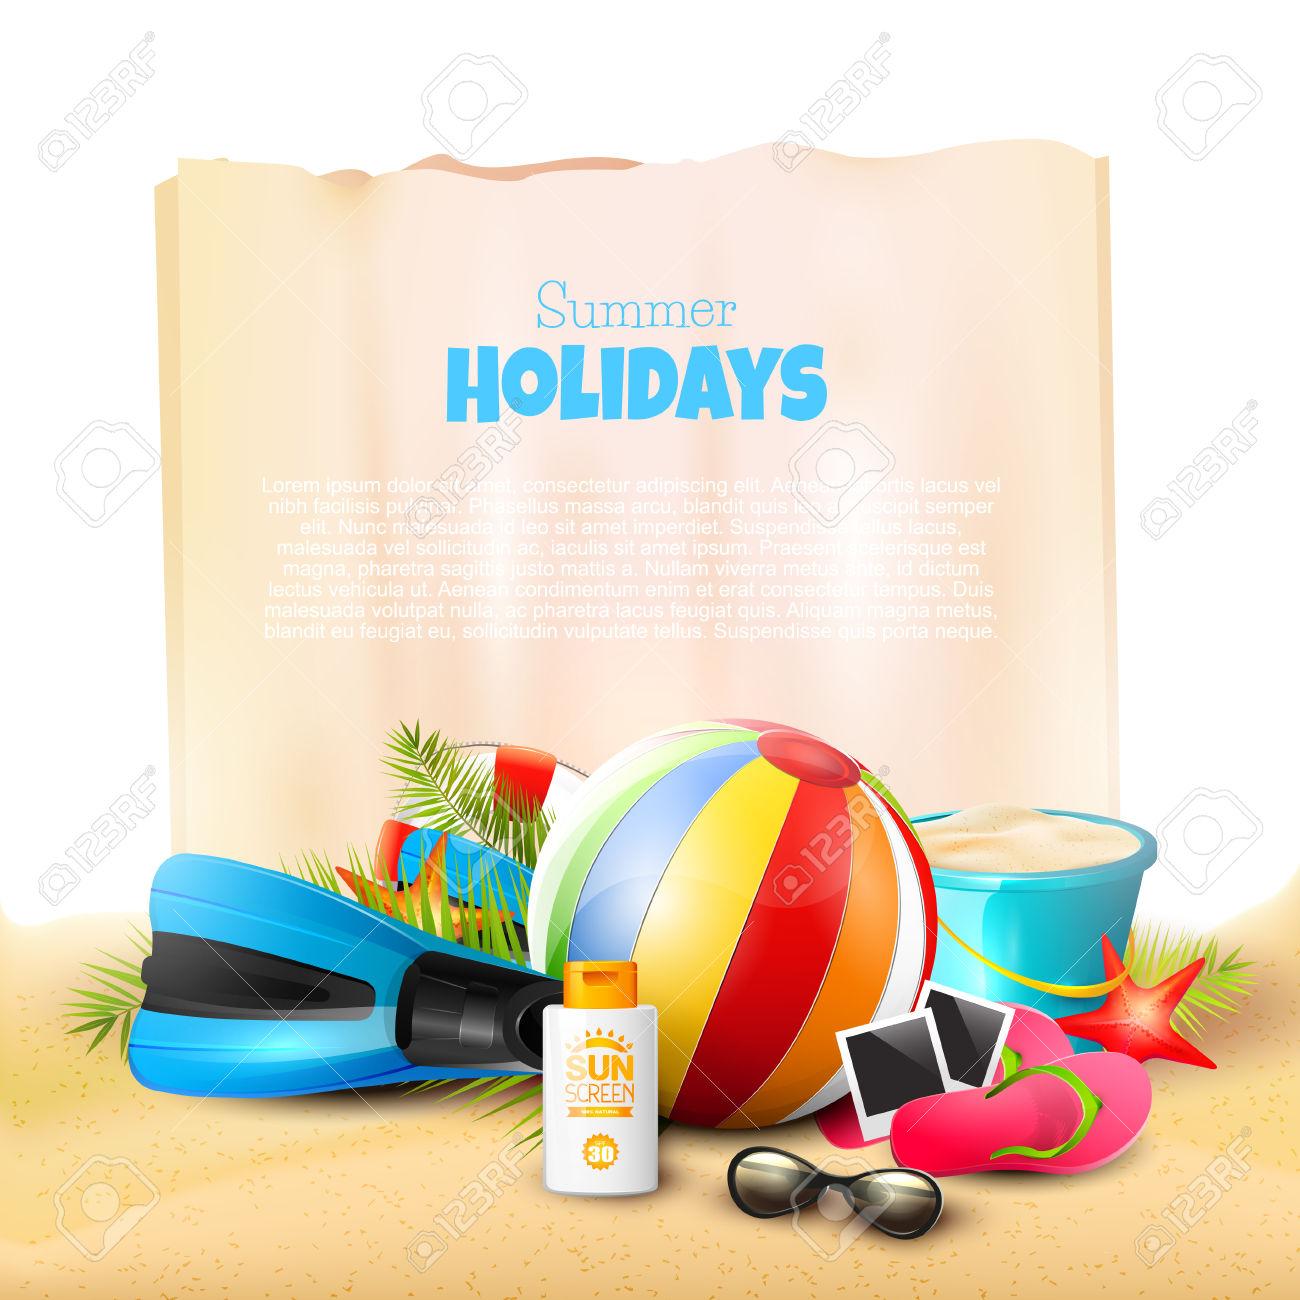 Beach Ball, Sunglasses, Palm Leaves, Diving Fins, Flip.